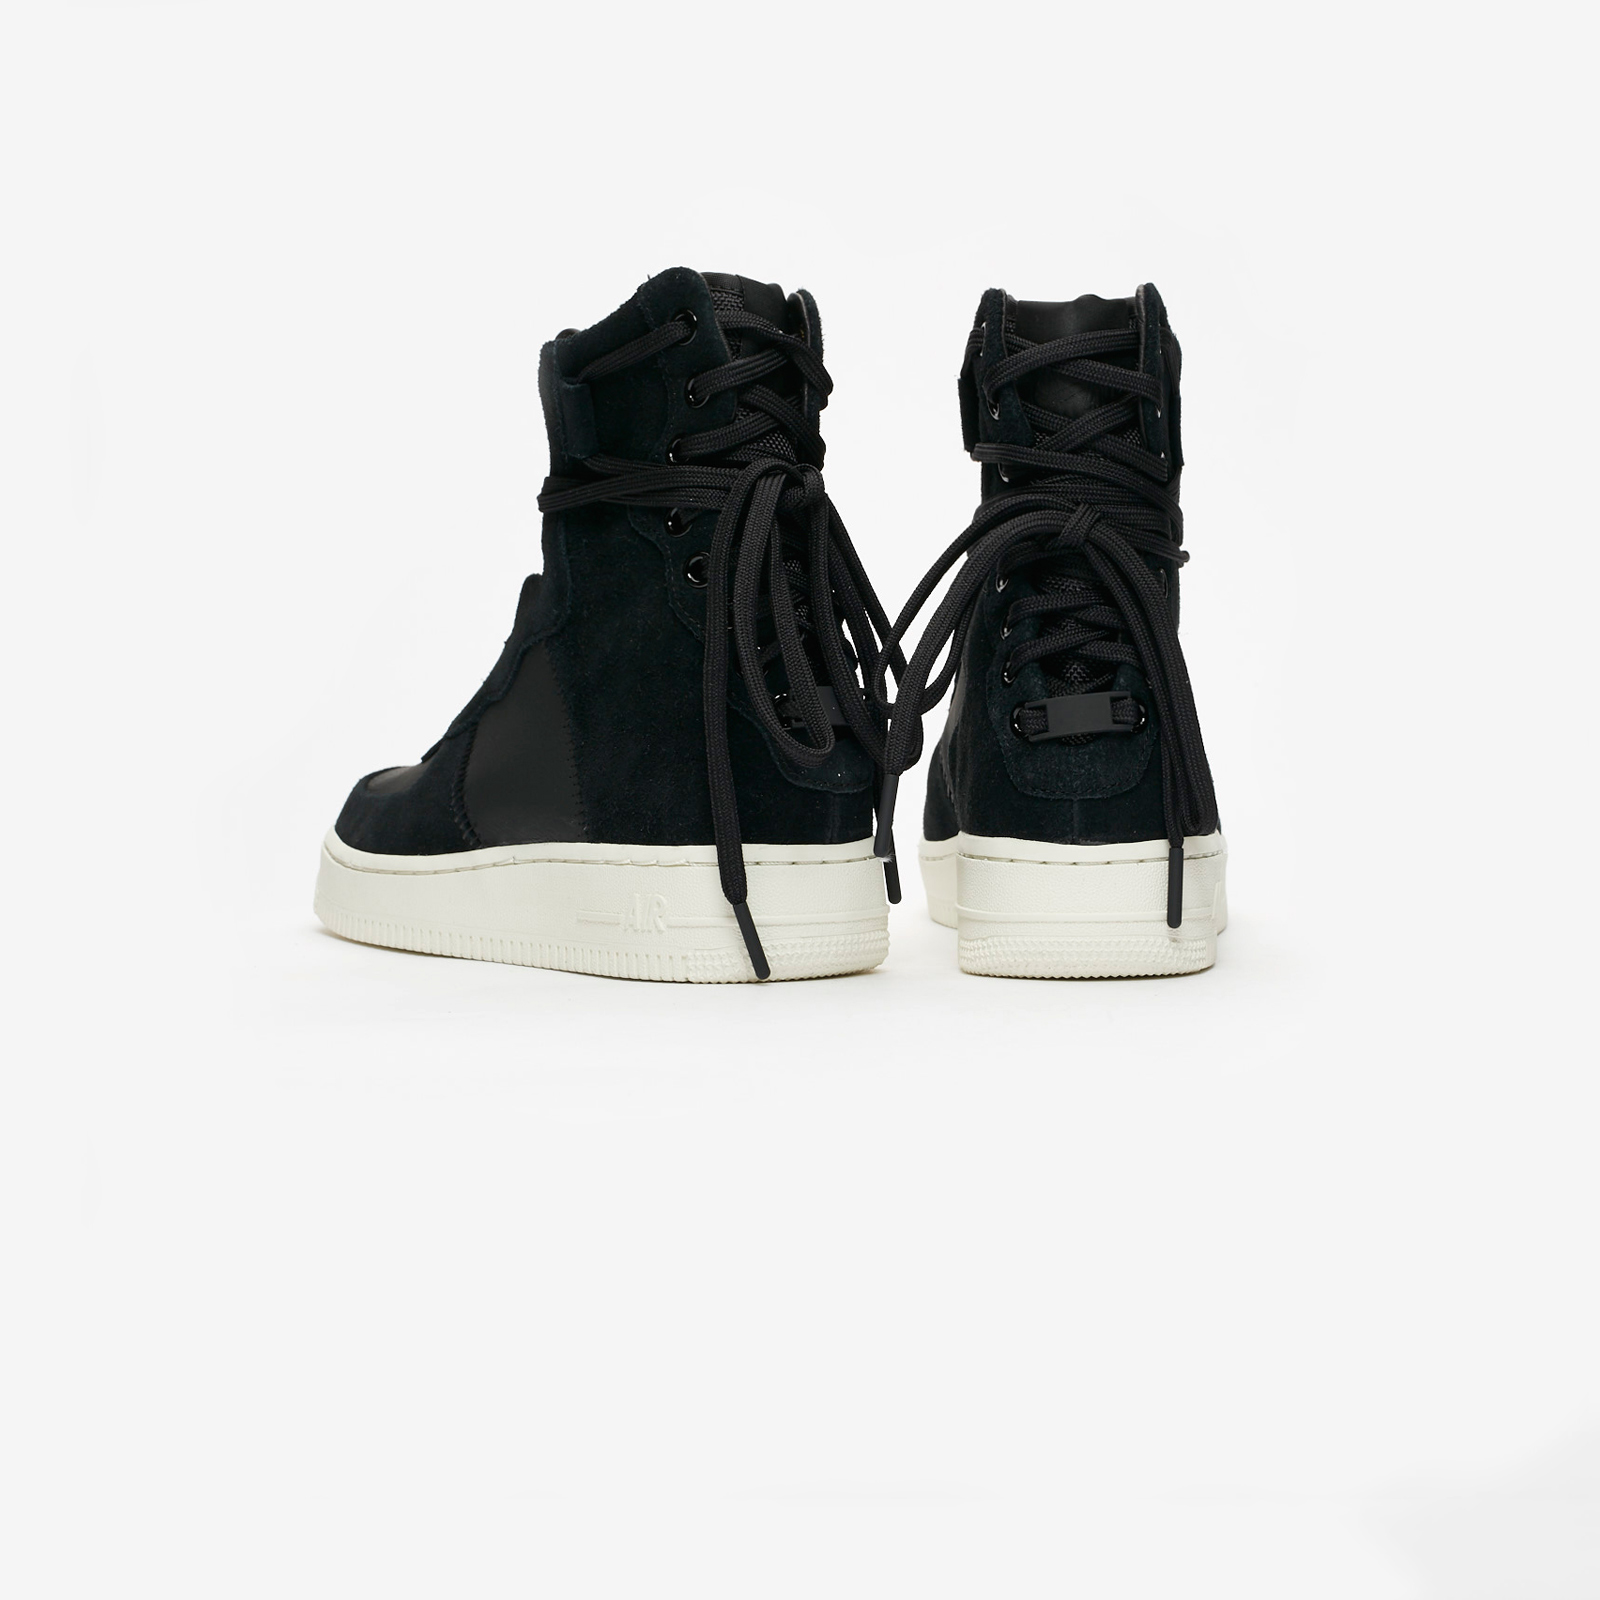 a6a5f452eff Nike Wmns Af1 Rebel Premium Bv8252 001 Sneakersnstuff